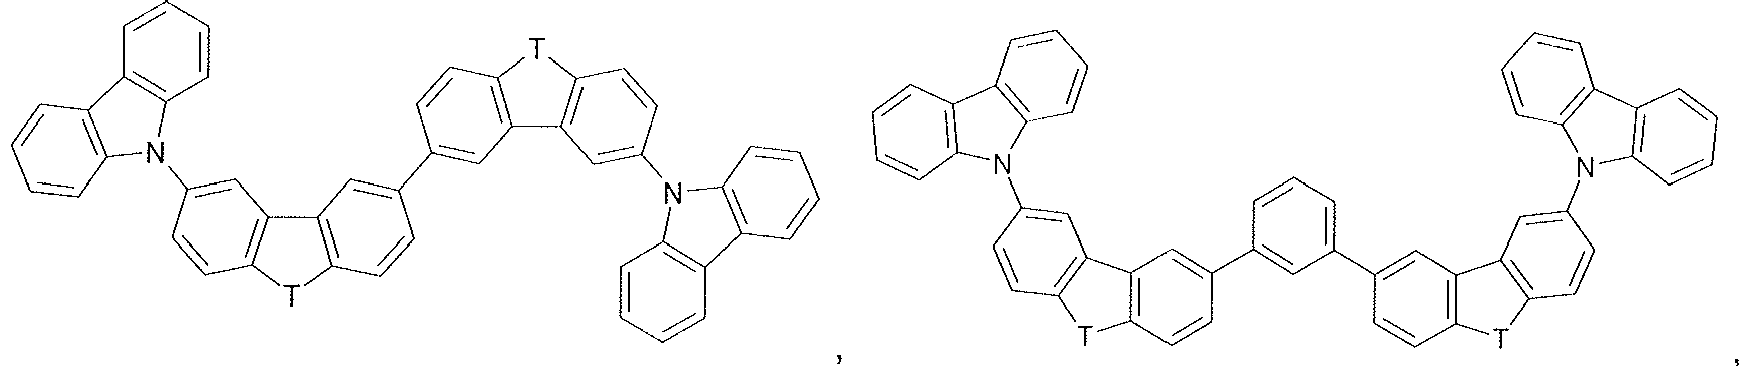 Figure imgb0687